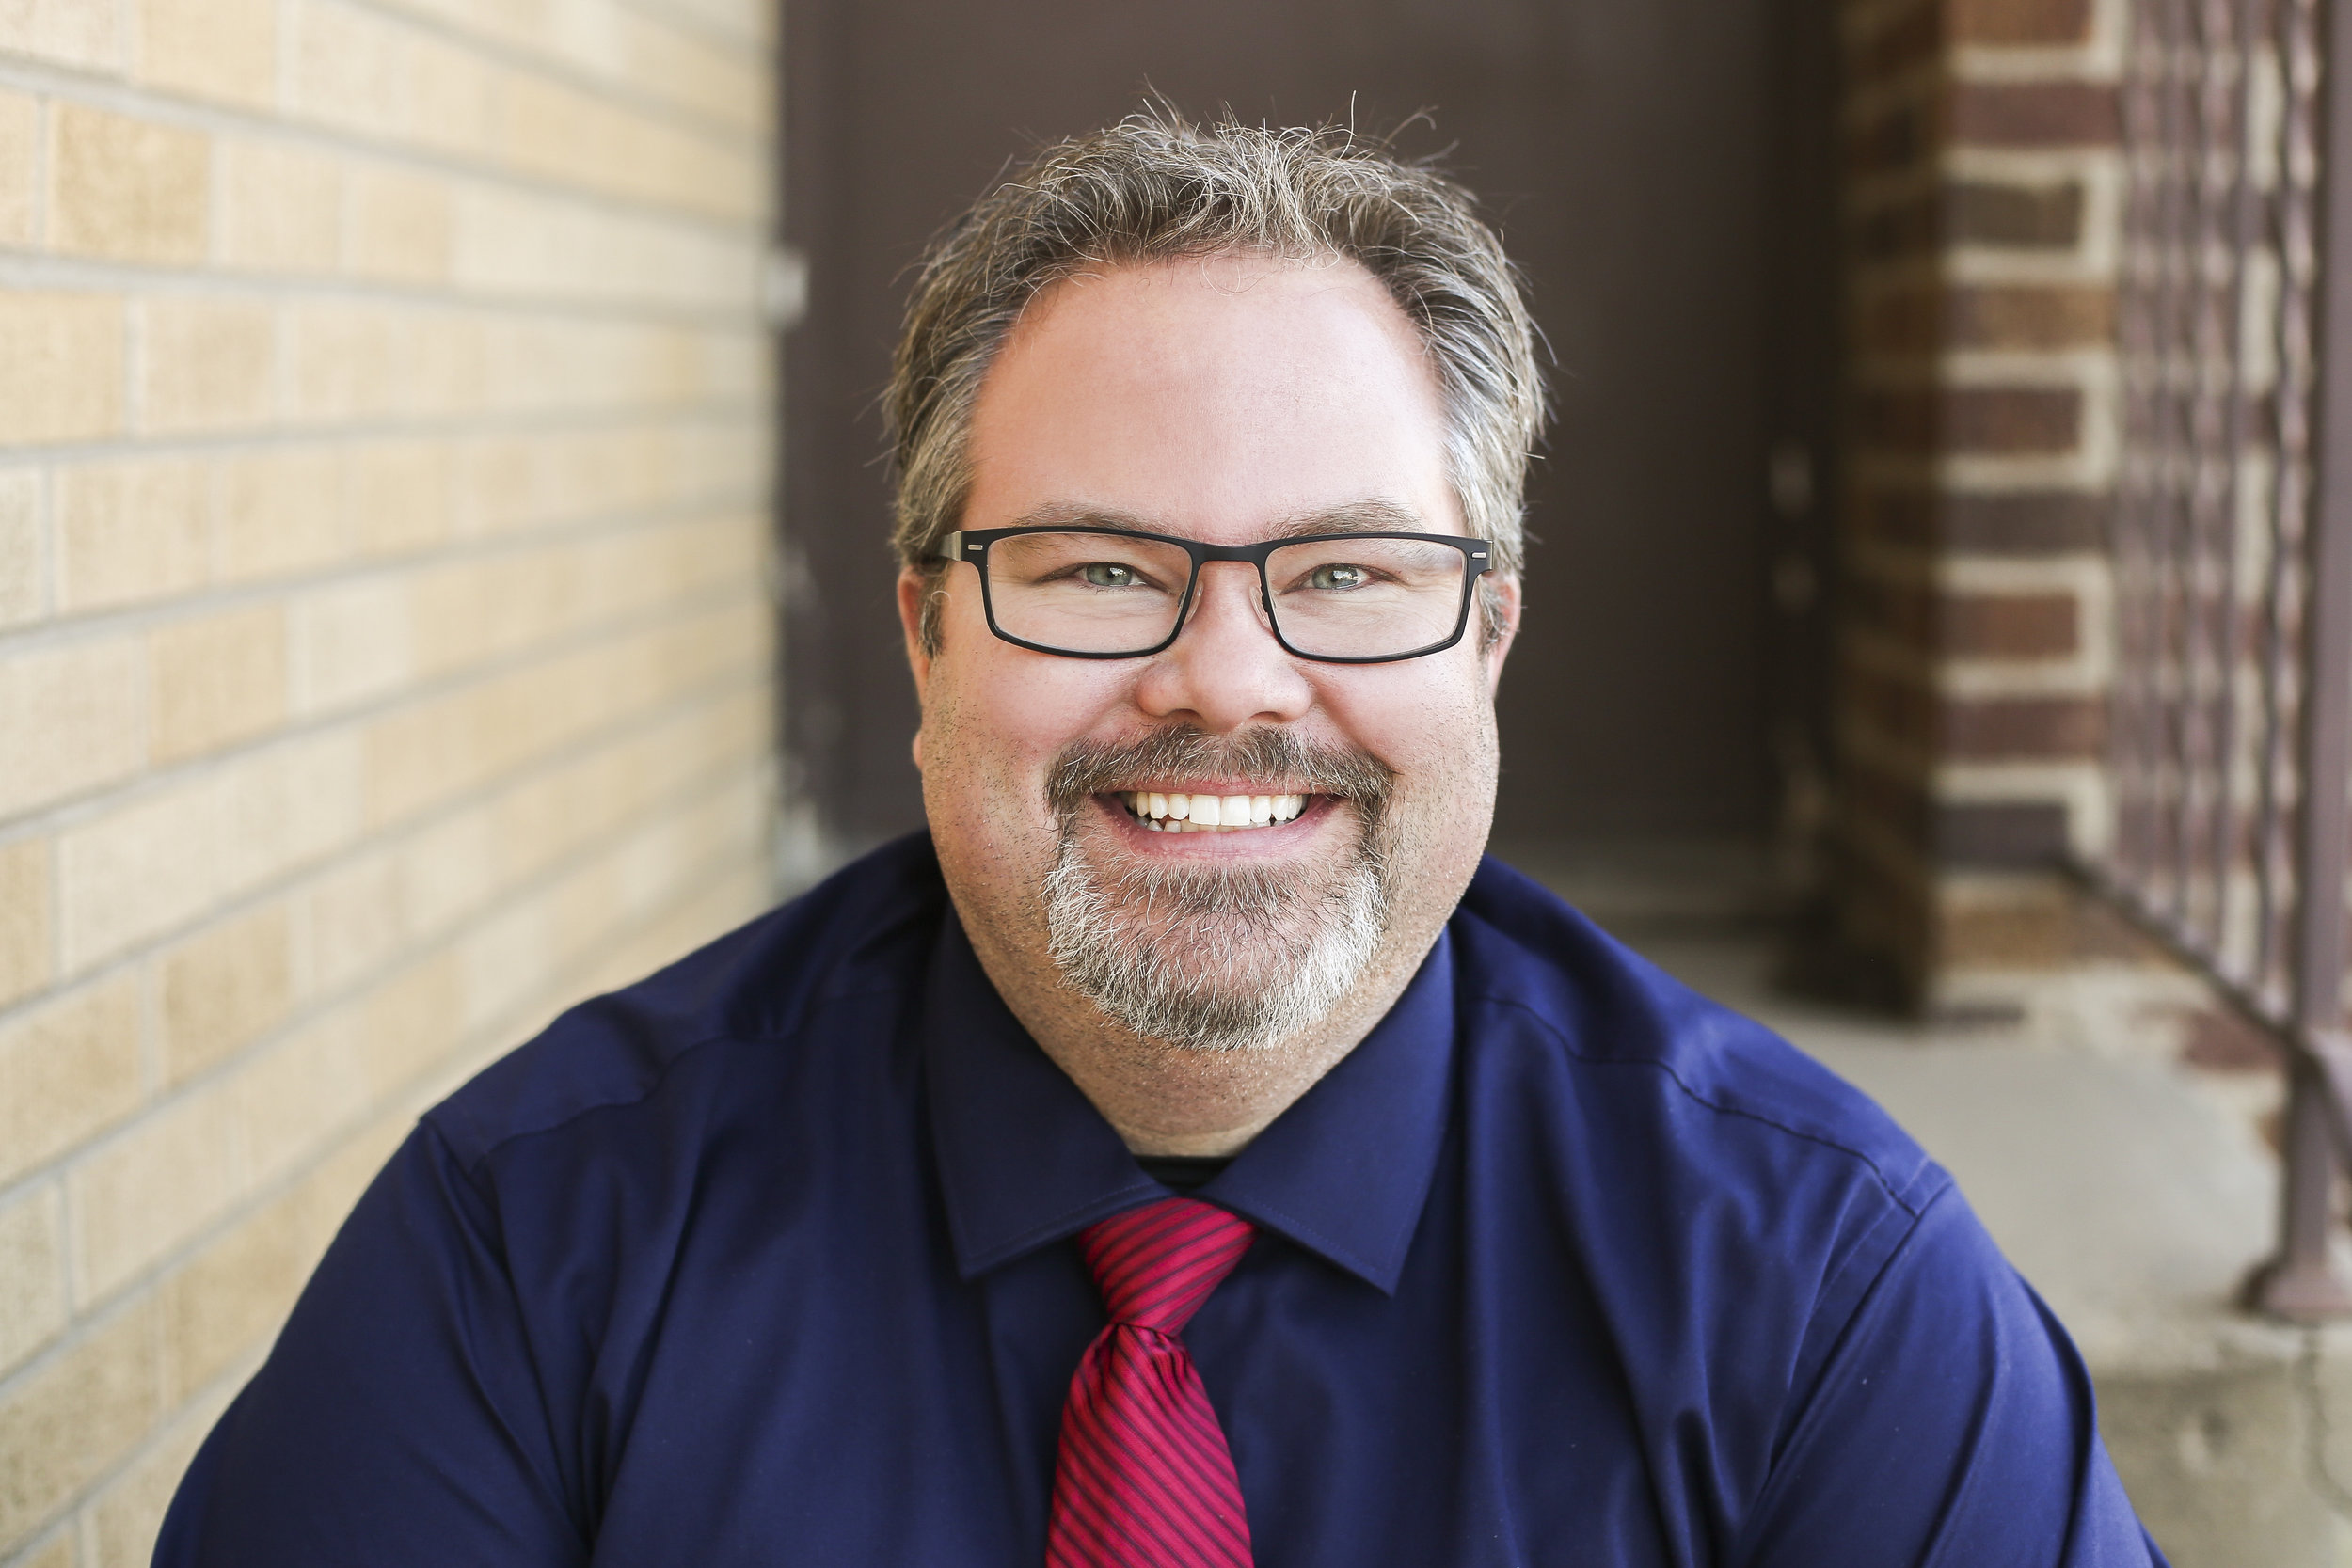 Brian haaland, president